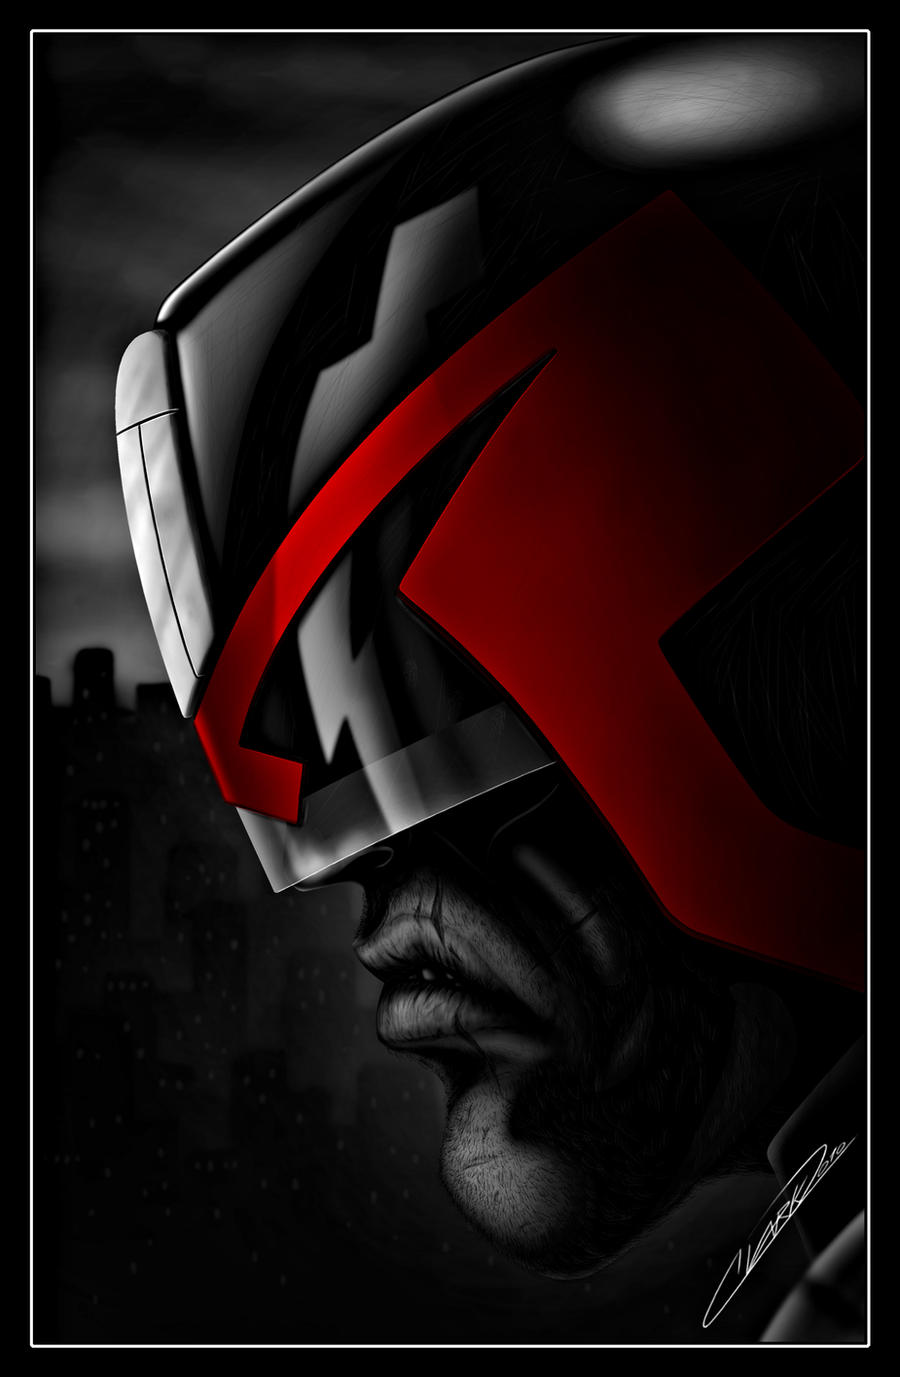 Better Dredd than Dead - red by GrandMaster-J5